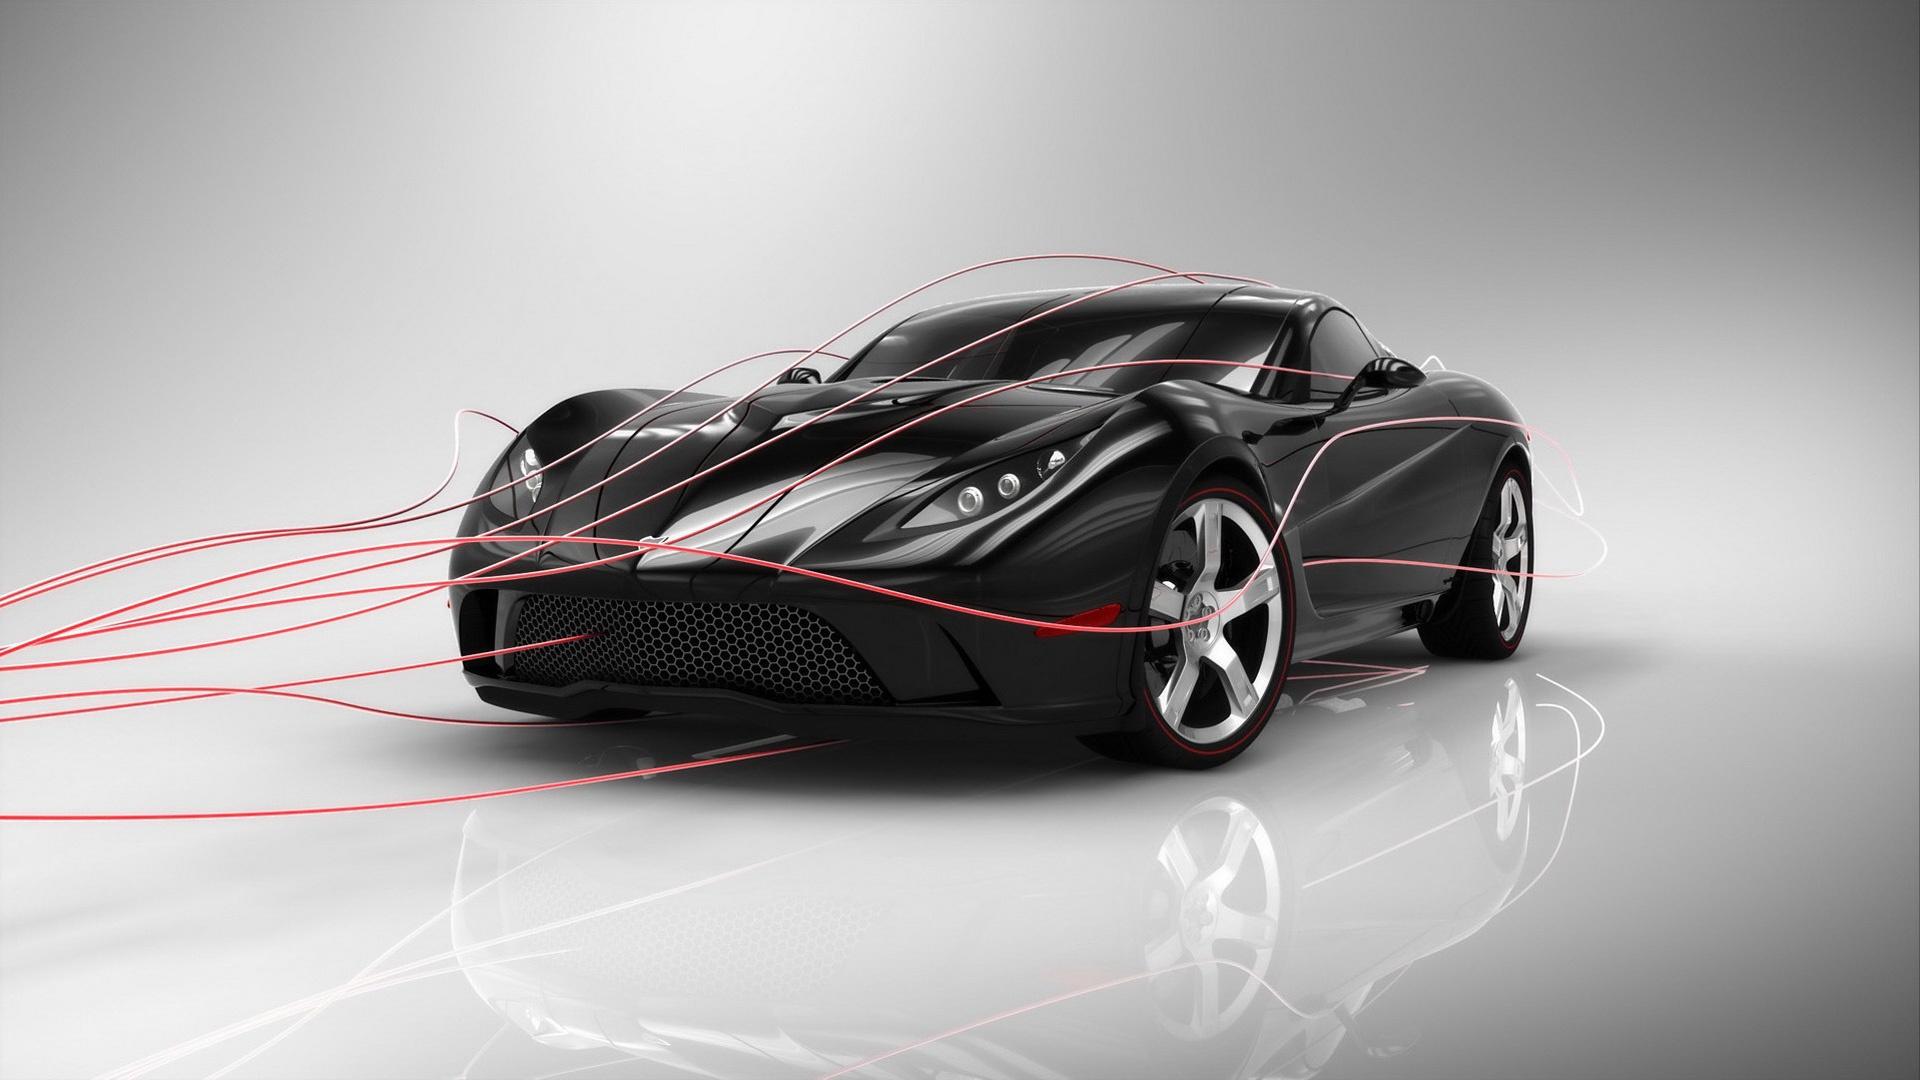 Corvette Concept Car Wallpaper